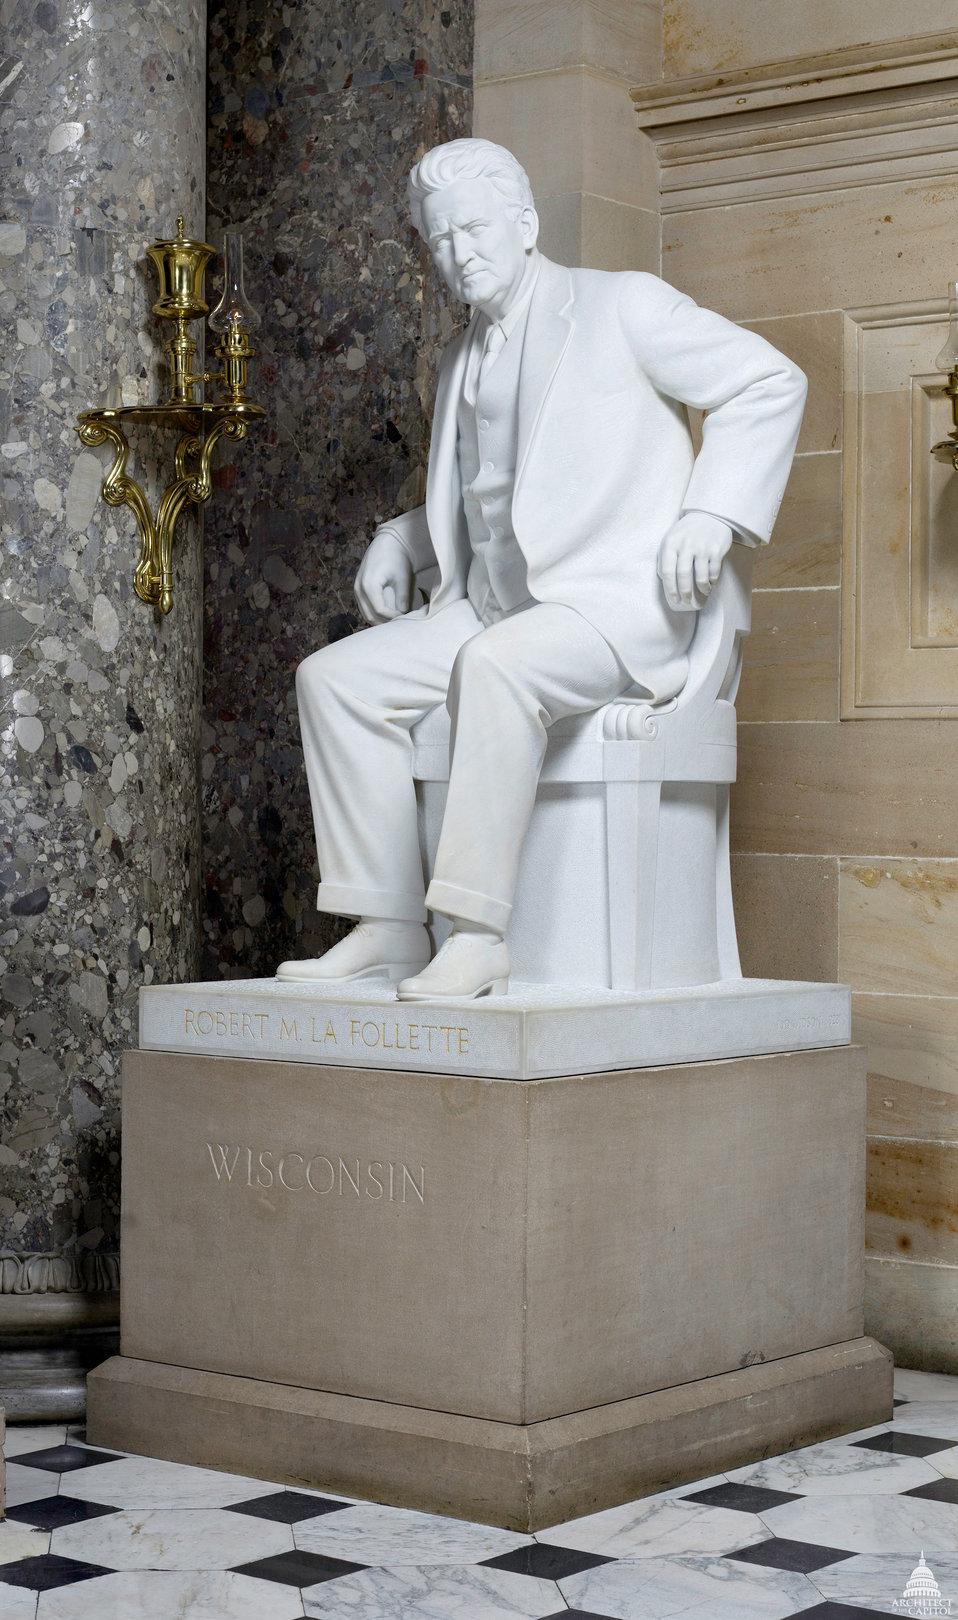 Robert M. La Follette Statue